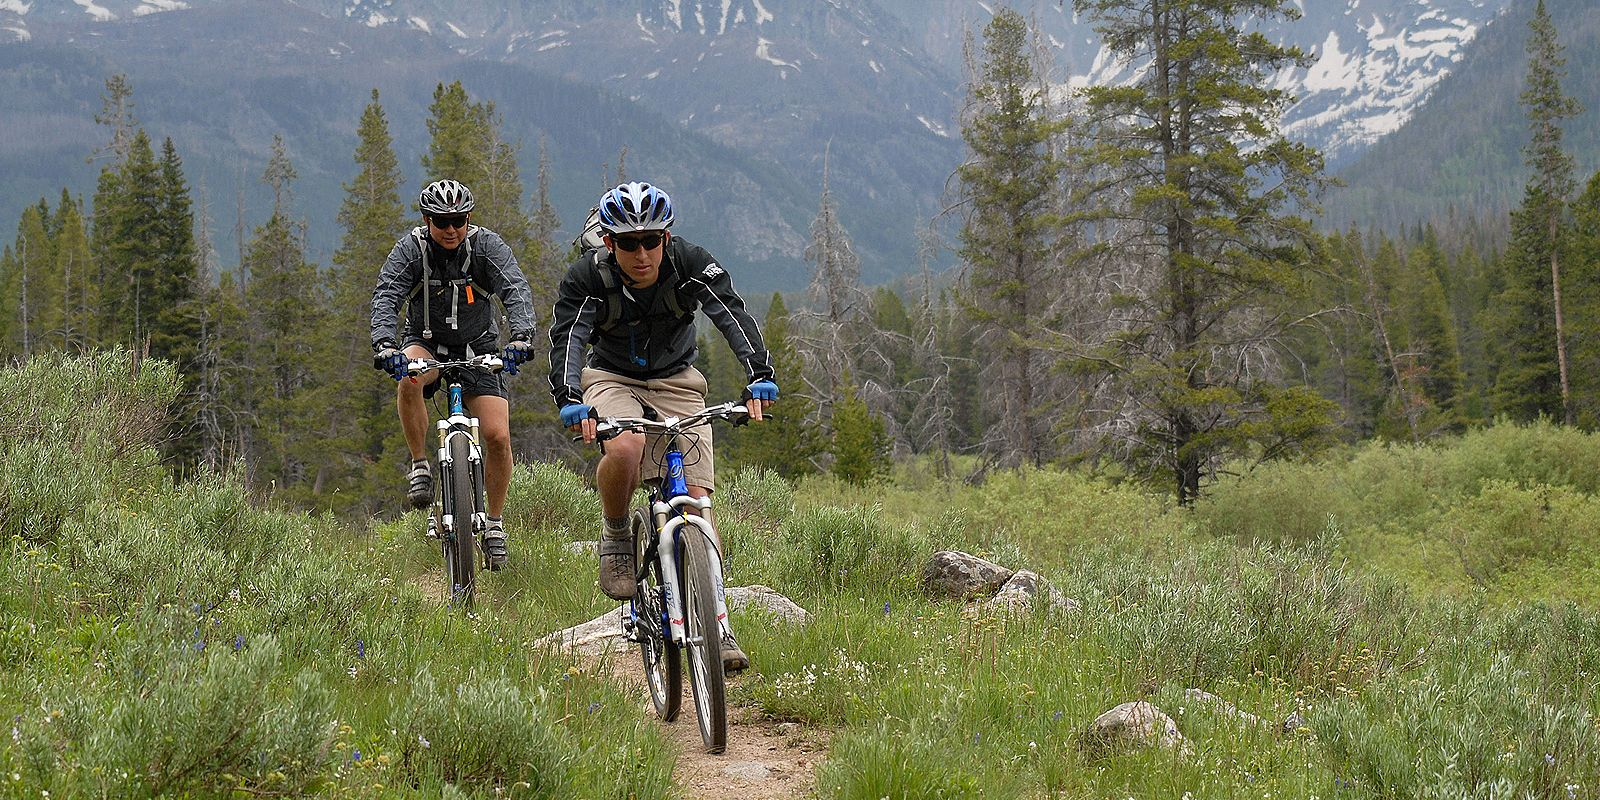 Biking in a mountain trail